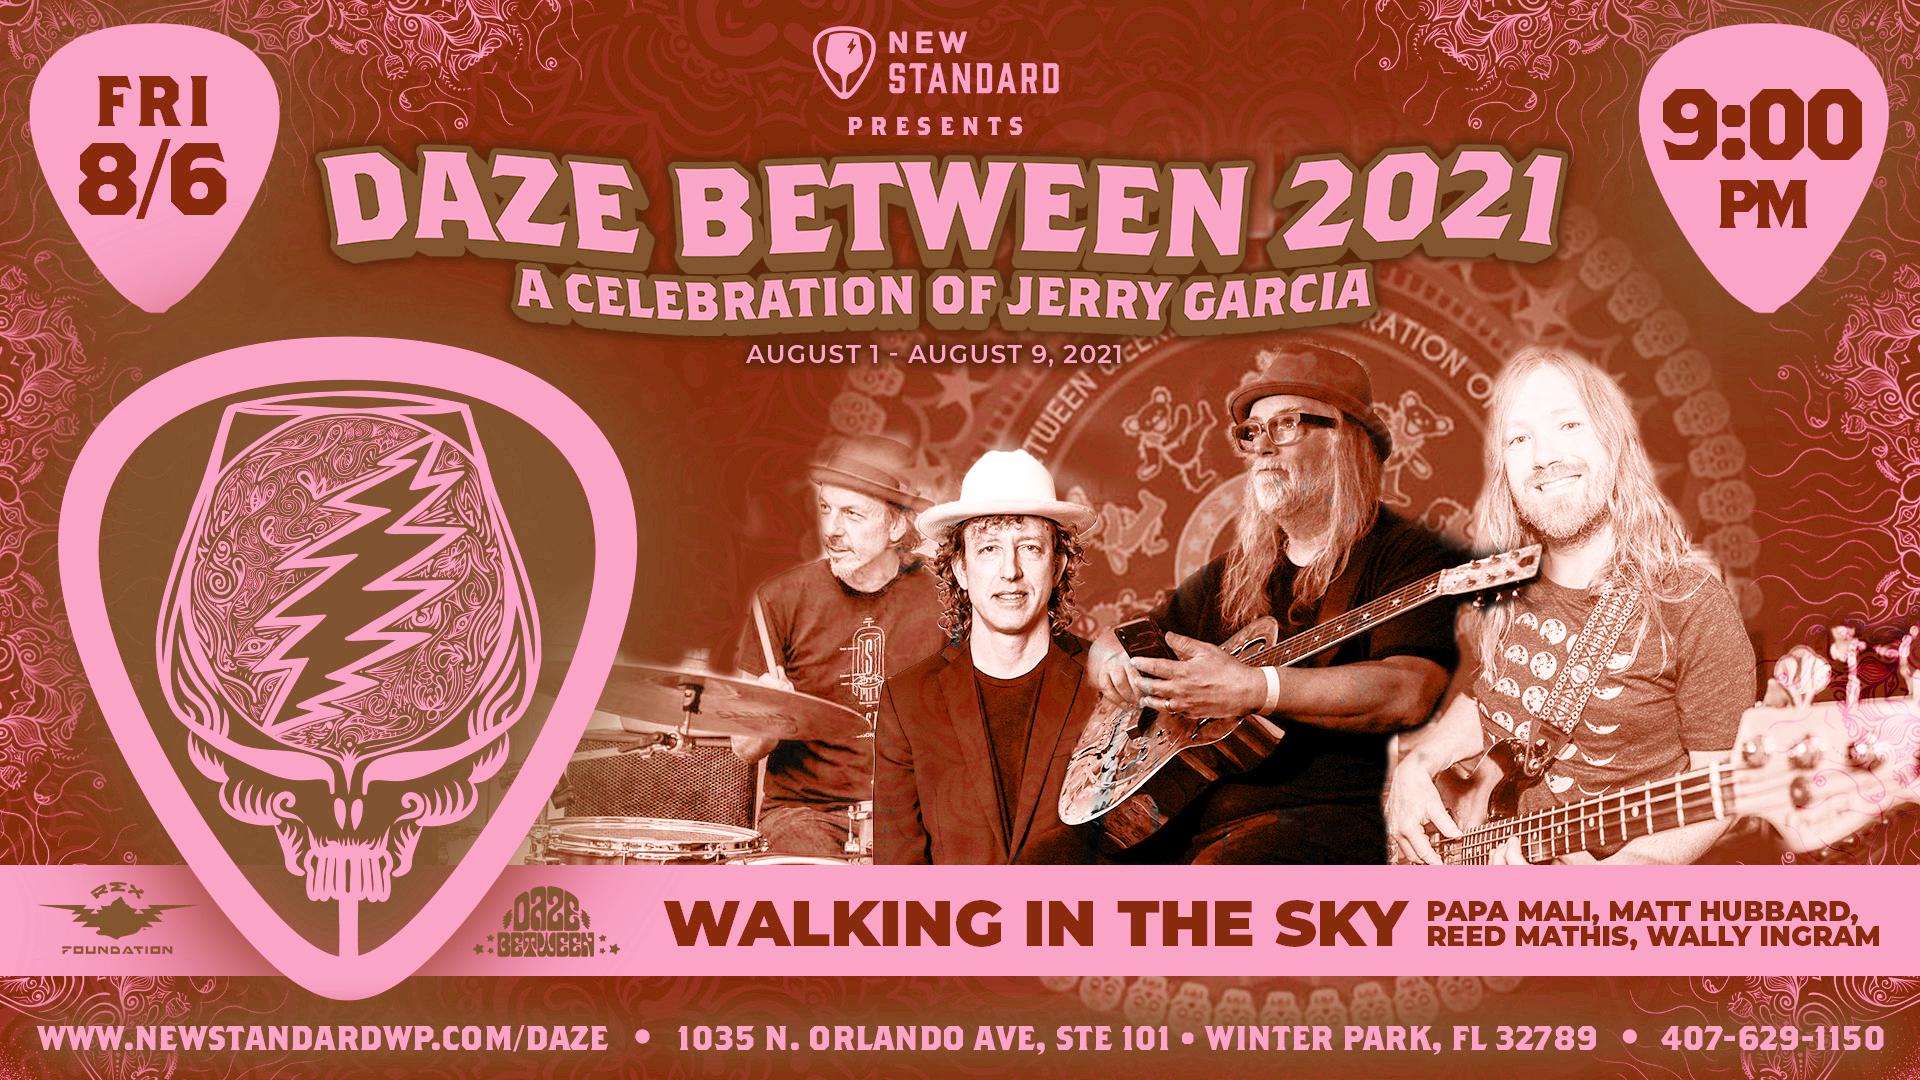 Photo for Walking In The Sky - Papa Mali, Matt Hubbard, Reed Mathis, & Wally Ingram - Daze Between 2021 - 8/6 on ViewStub